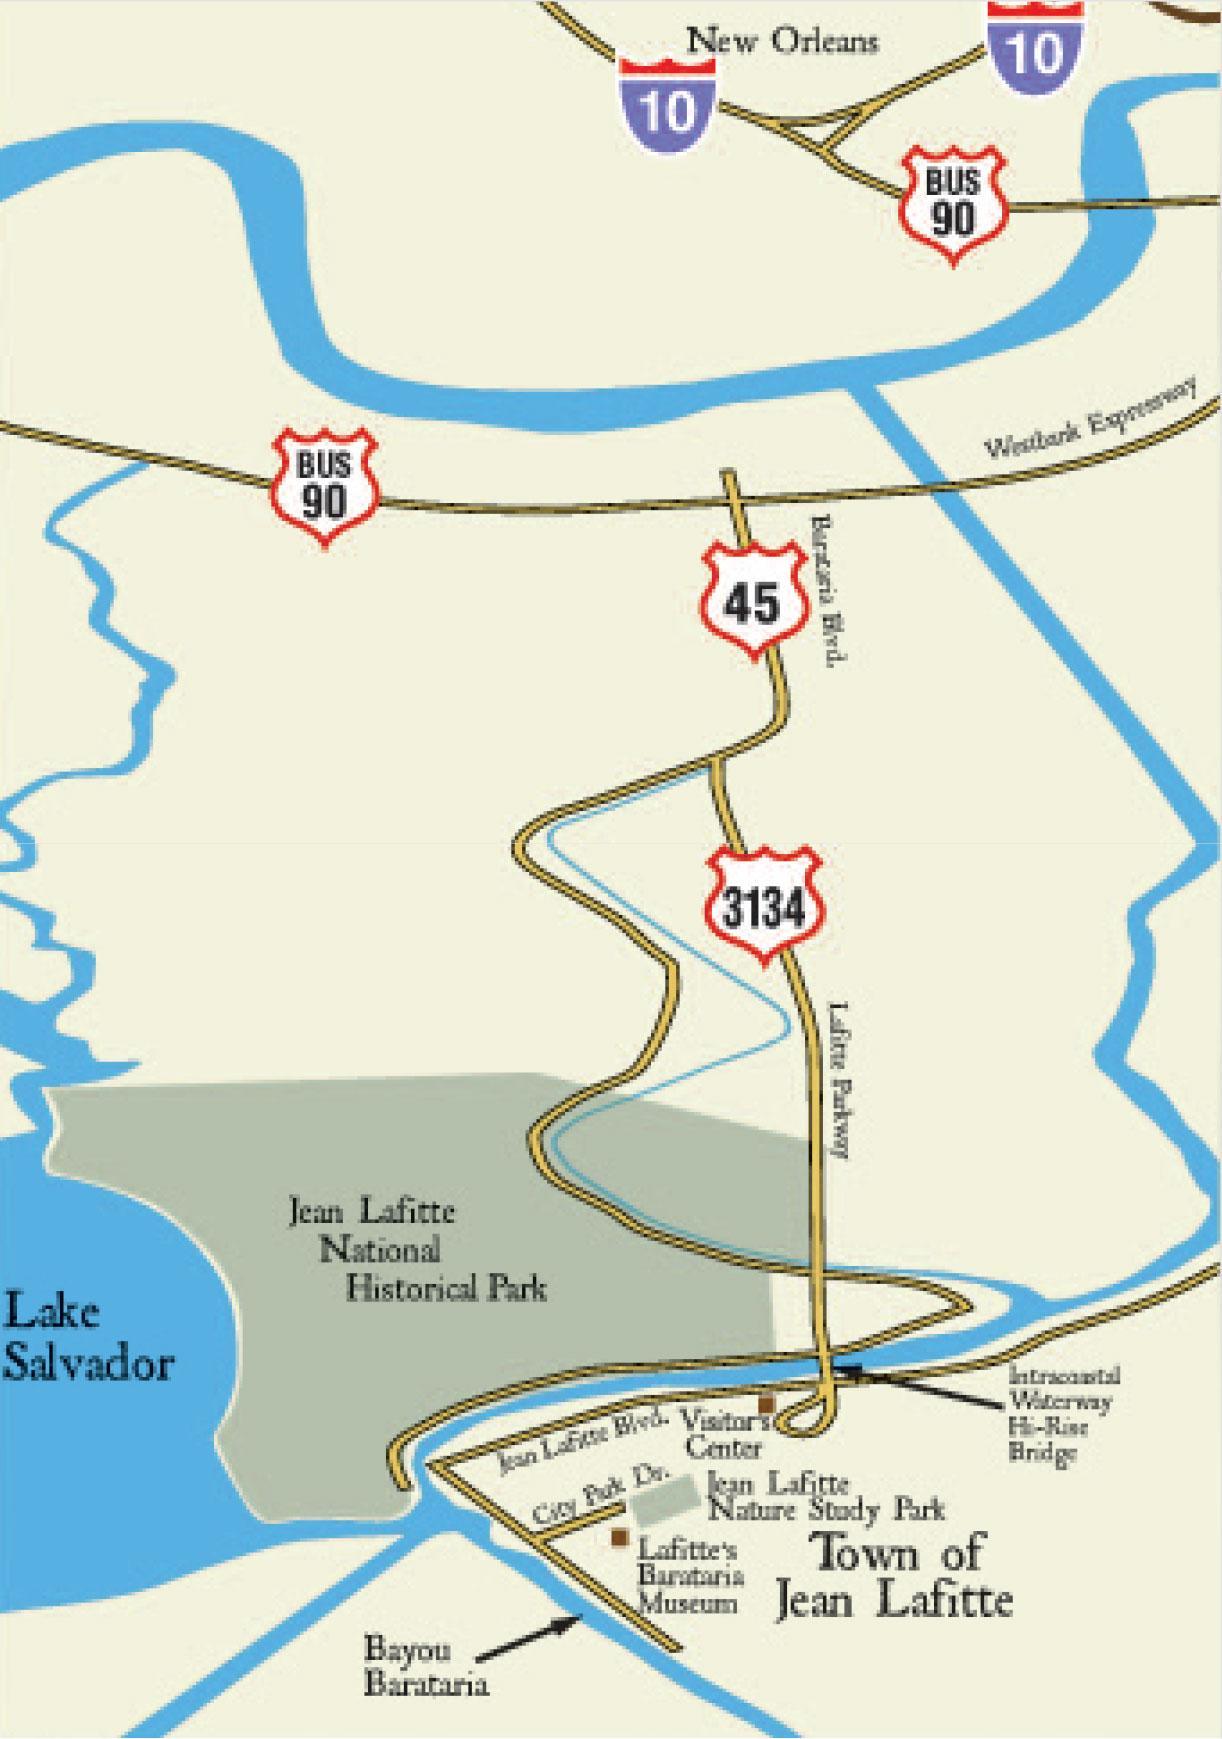 map to Jean Lafitte